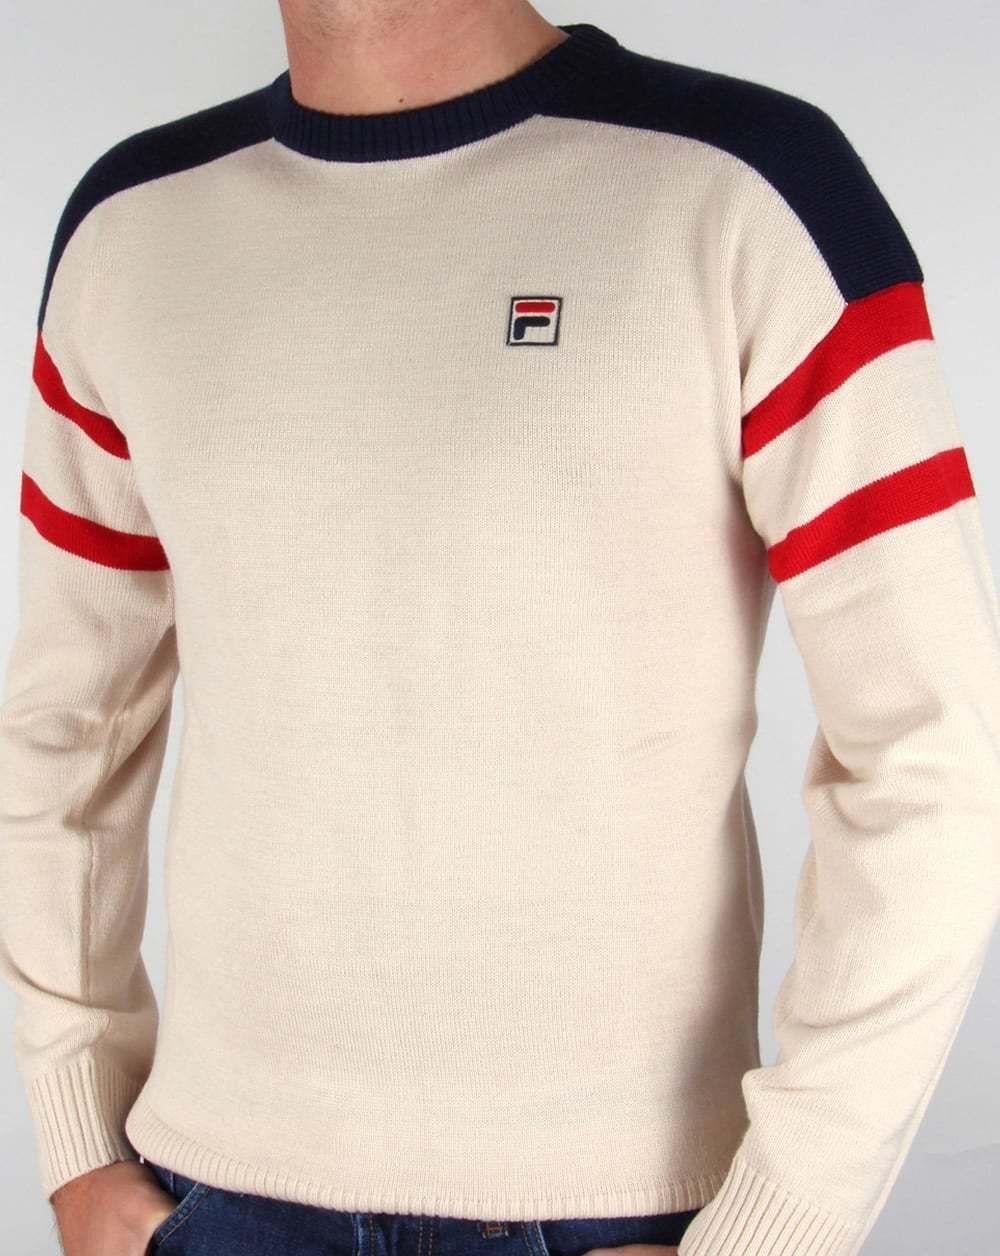 best service 57110 cf77e Fila Vintage Febbio Jumper in Gardenia - knitted sweatshirt crew neck ski   eBay mens small £55